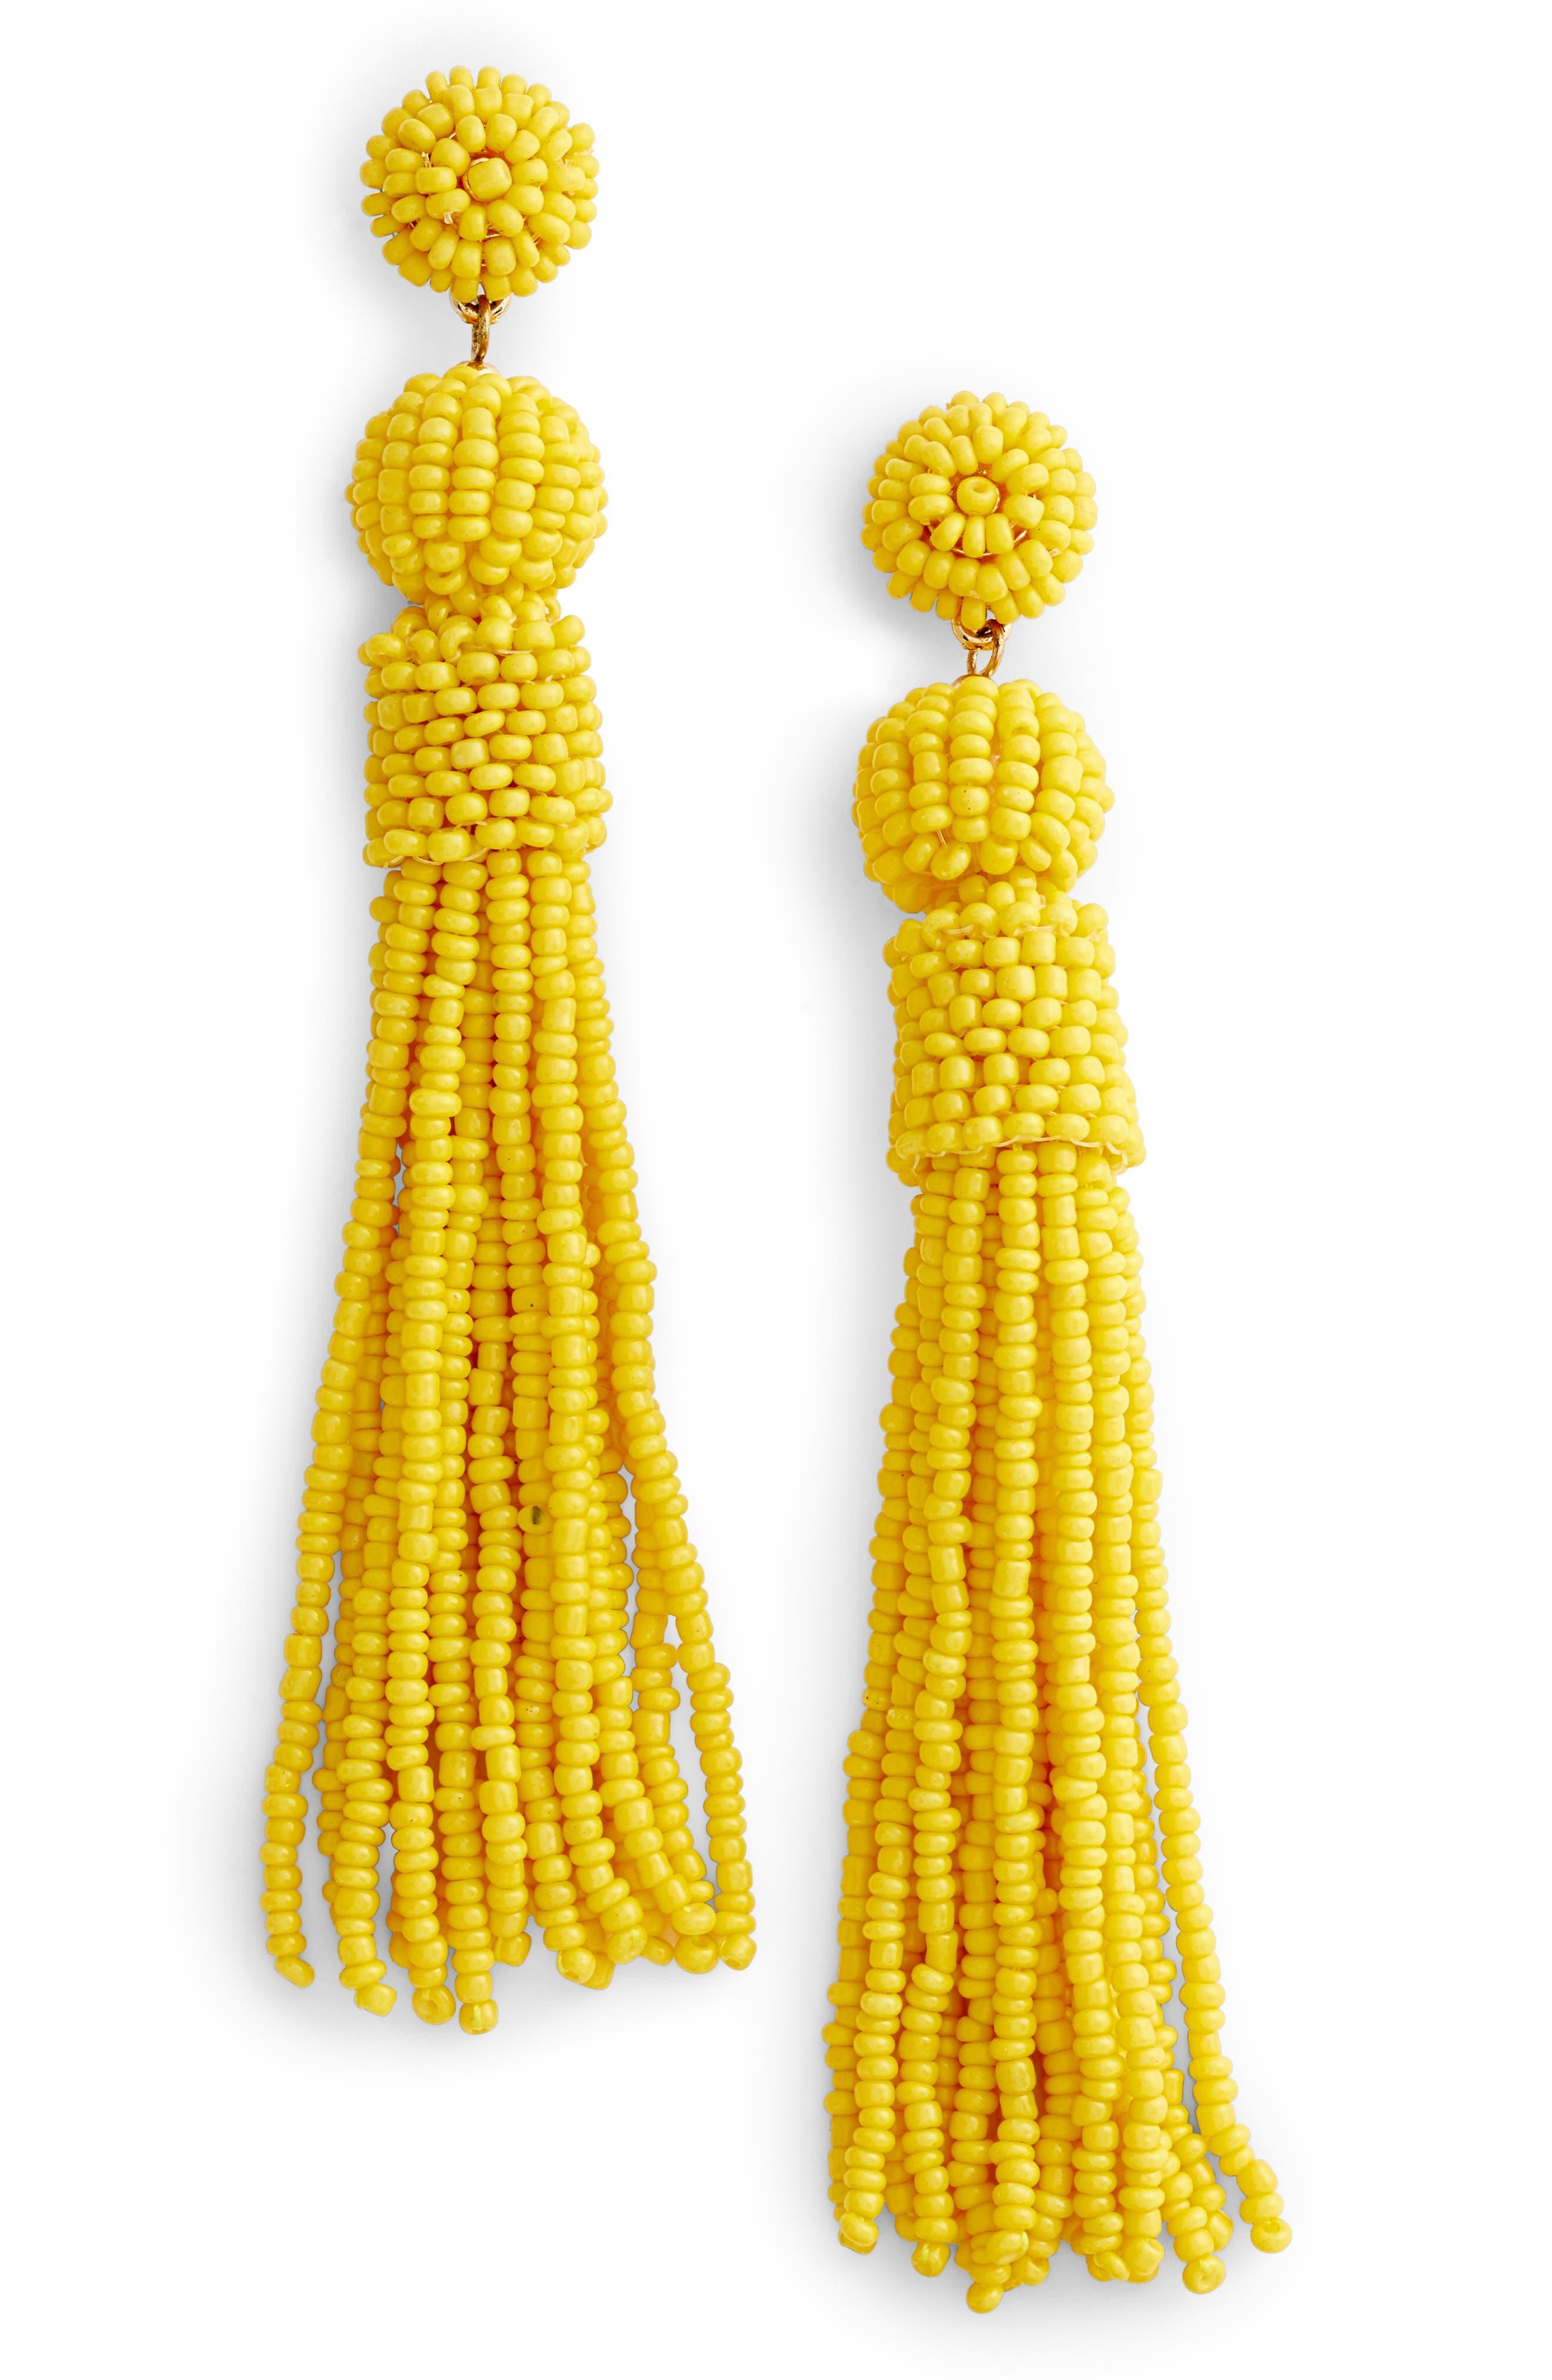 Mariachi Beaded Tassel Earrings,                             Main thumbnail 1, color,                             Neon Yellow